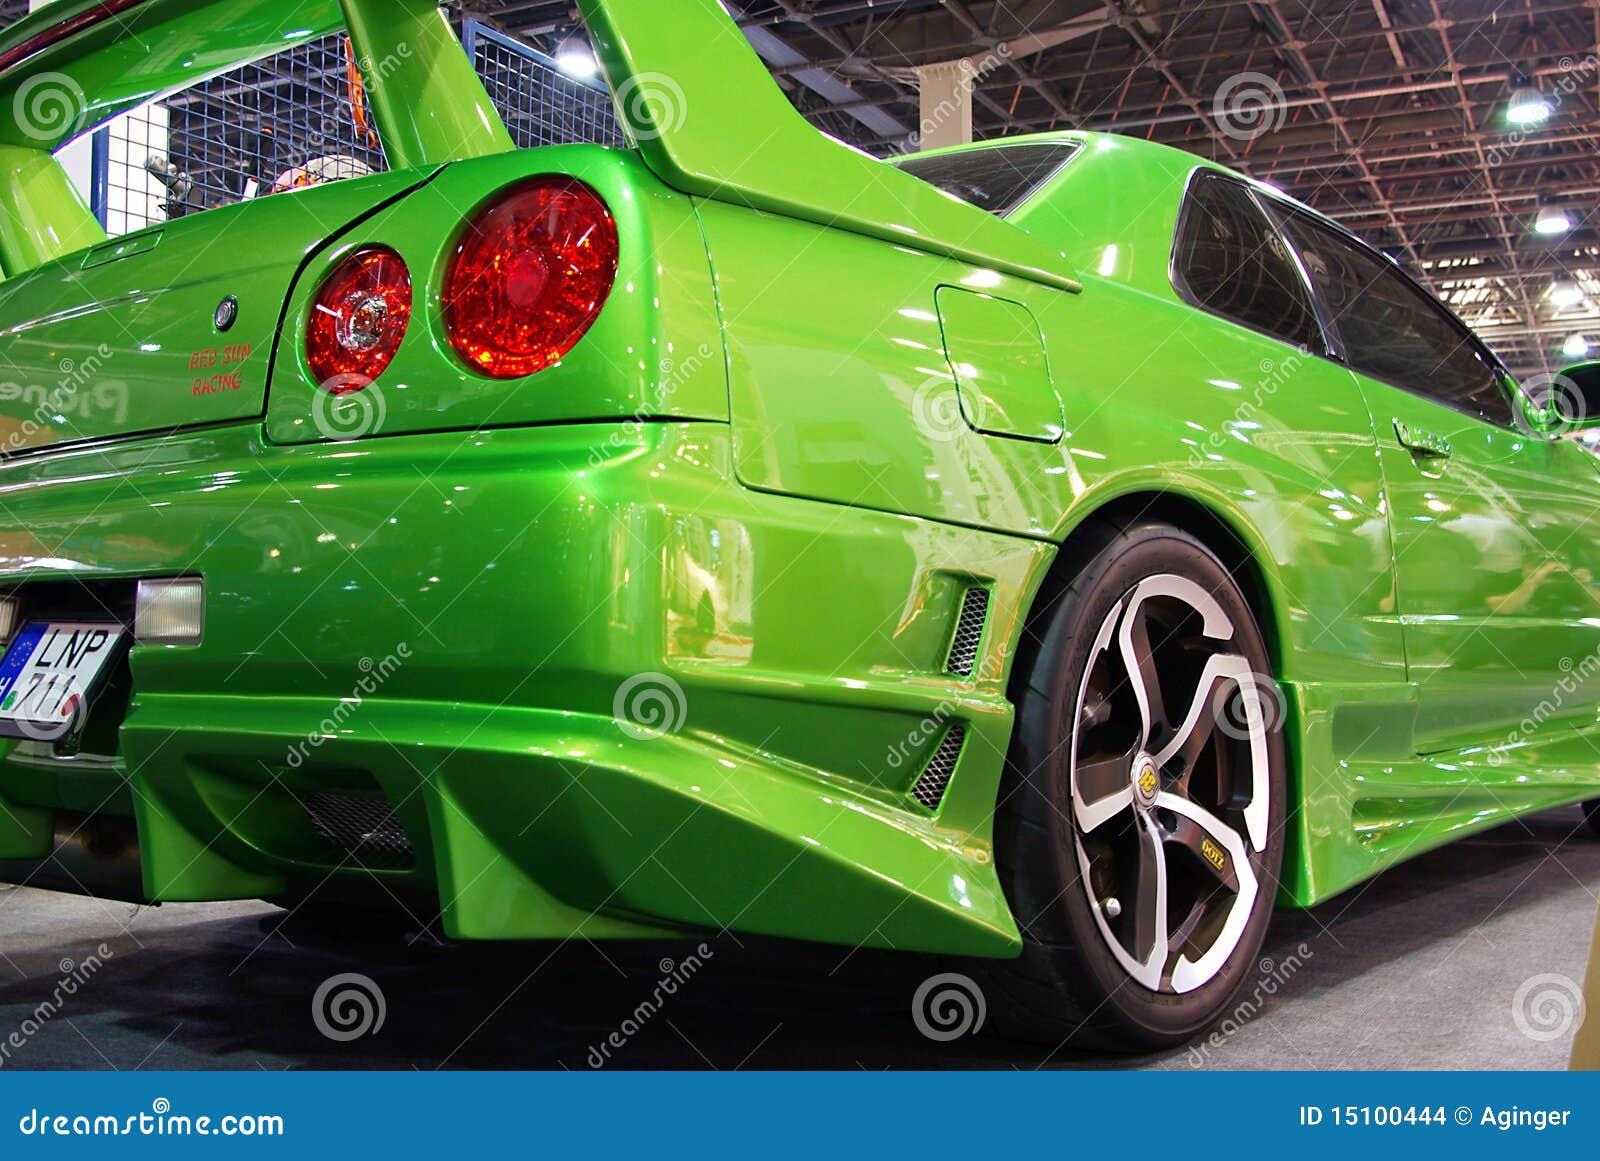 green nissan skyline editorial stock image image of carshow 15100444 rh dreamstime com Dealer Nissan Skyline GTR R34 GTR Black Nissan Skyline GTR R34 Wallpaper